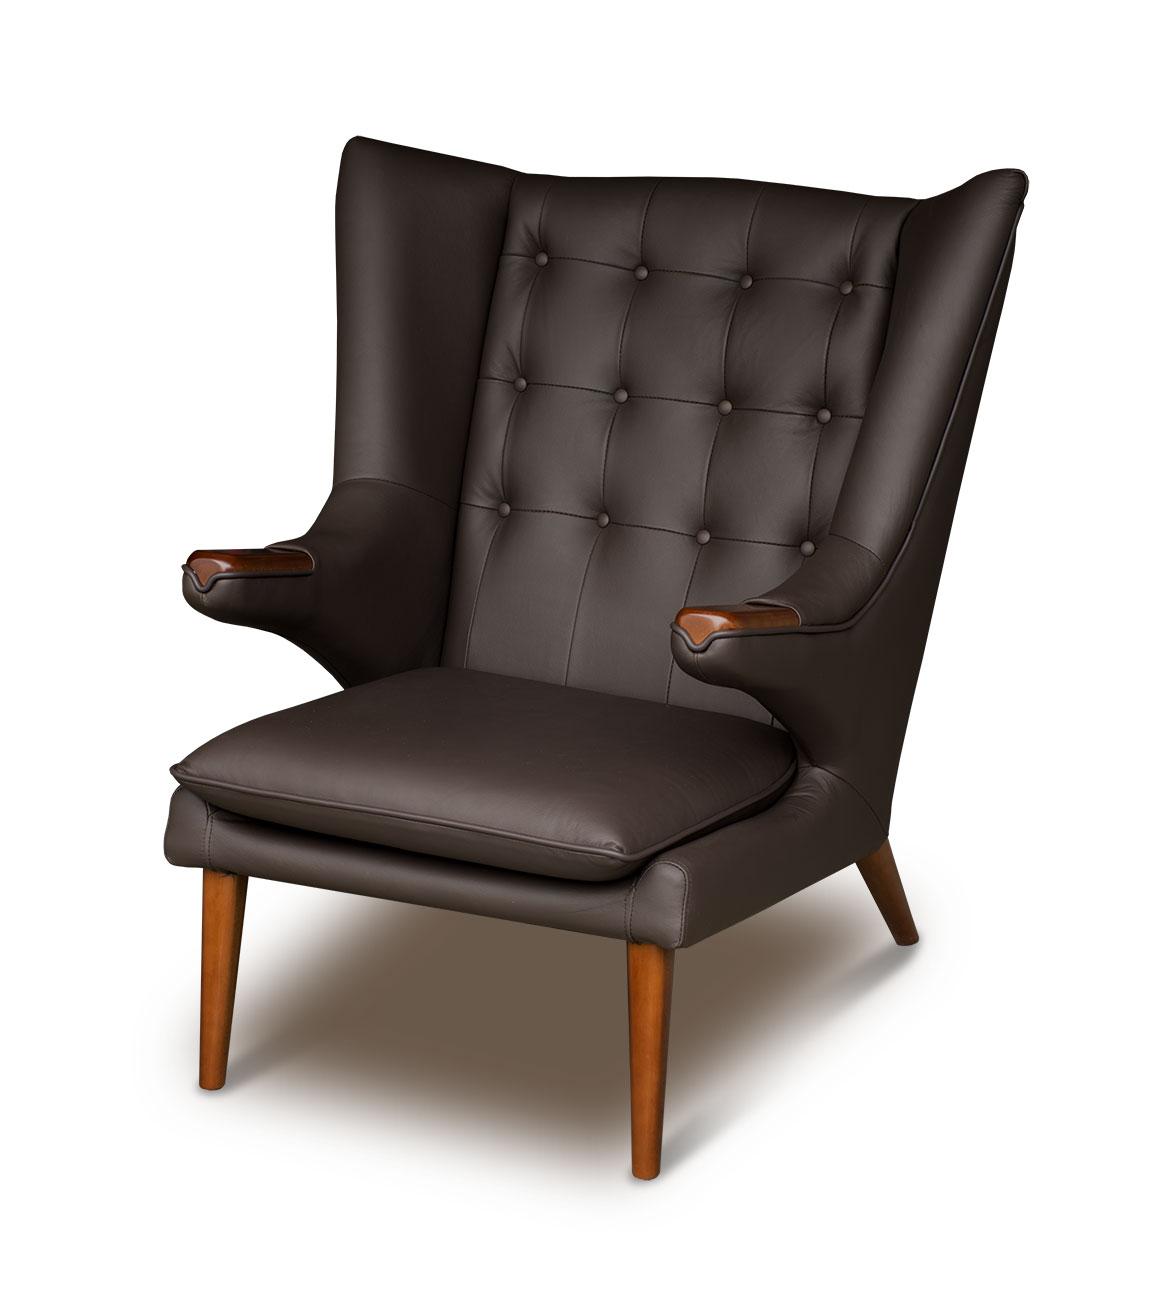 vintage leder ohrensessel dunkelbraun neuerraum. Black Bedroom Furniture Sets. Home Design Ideas